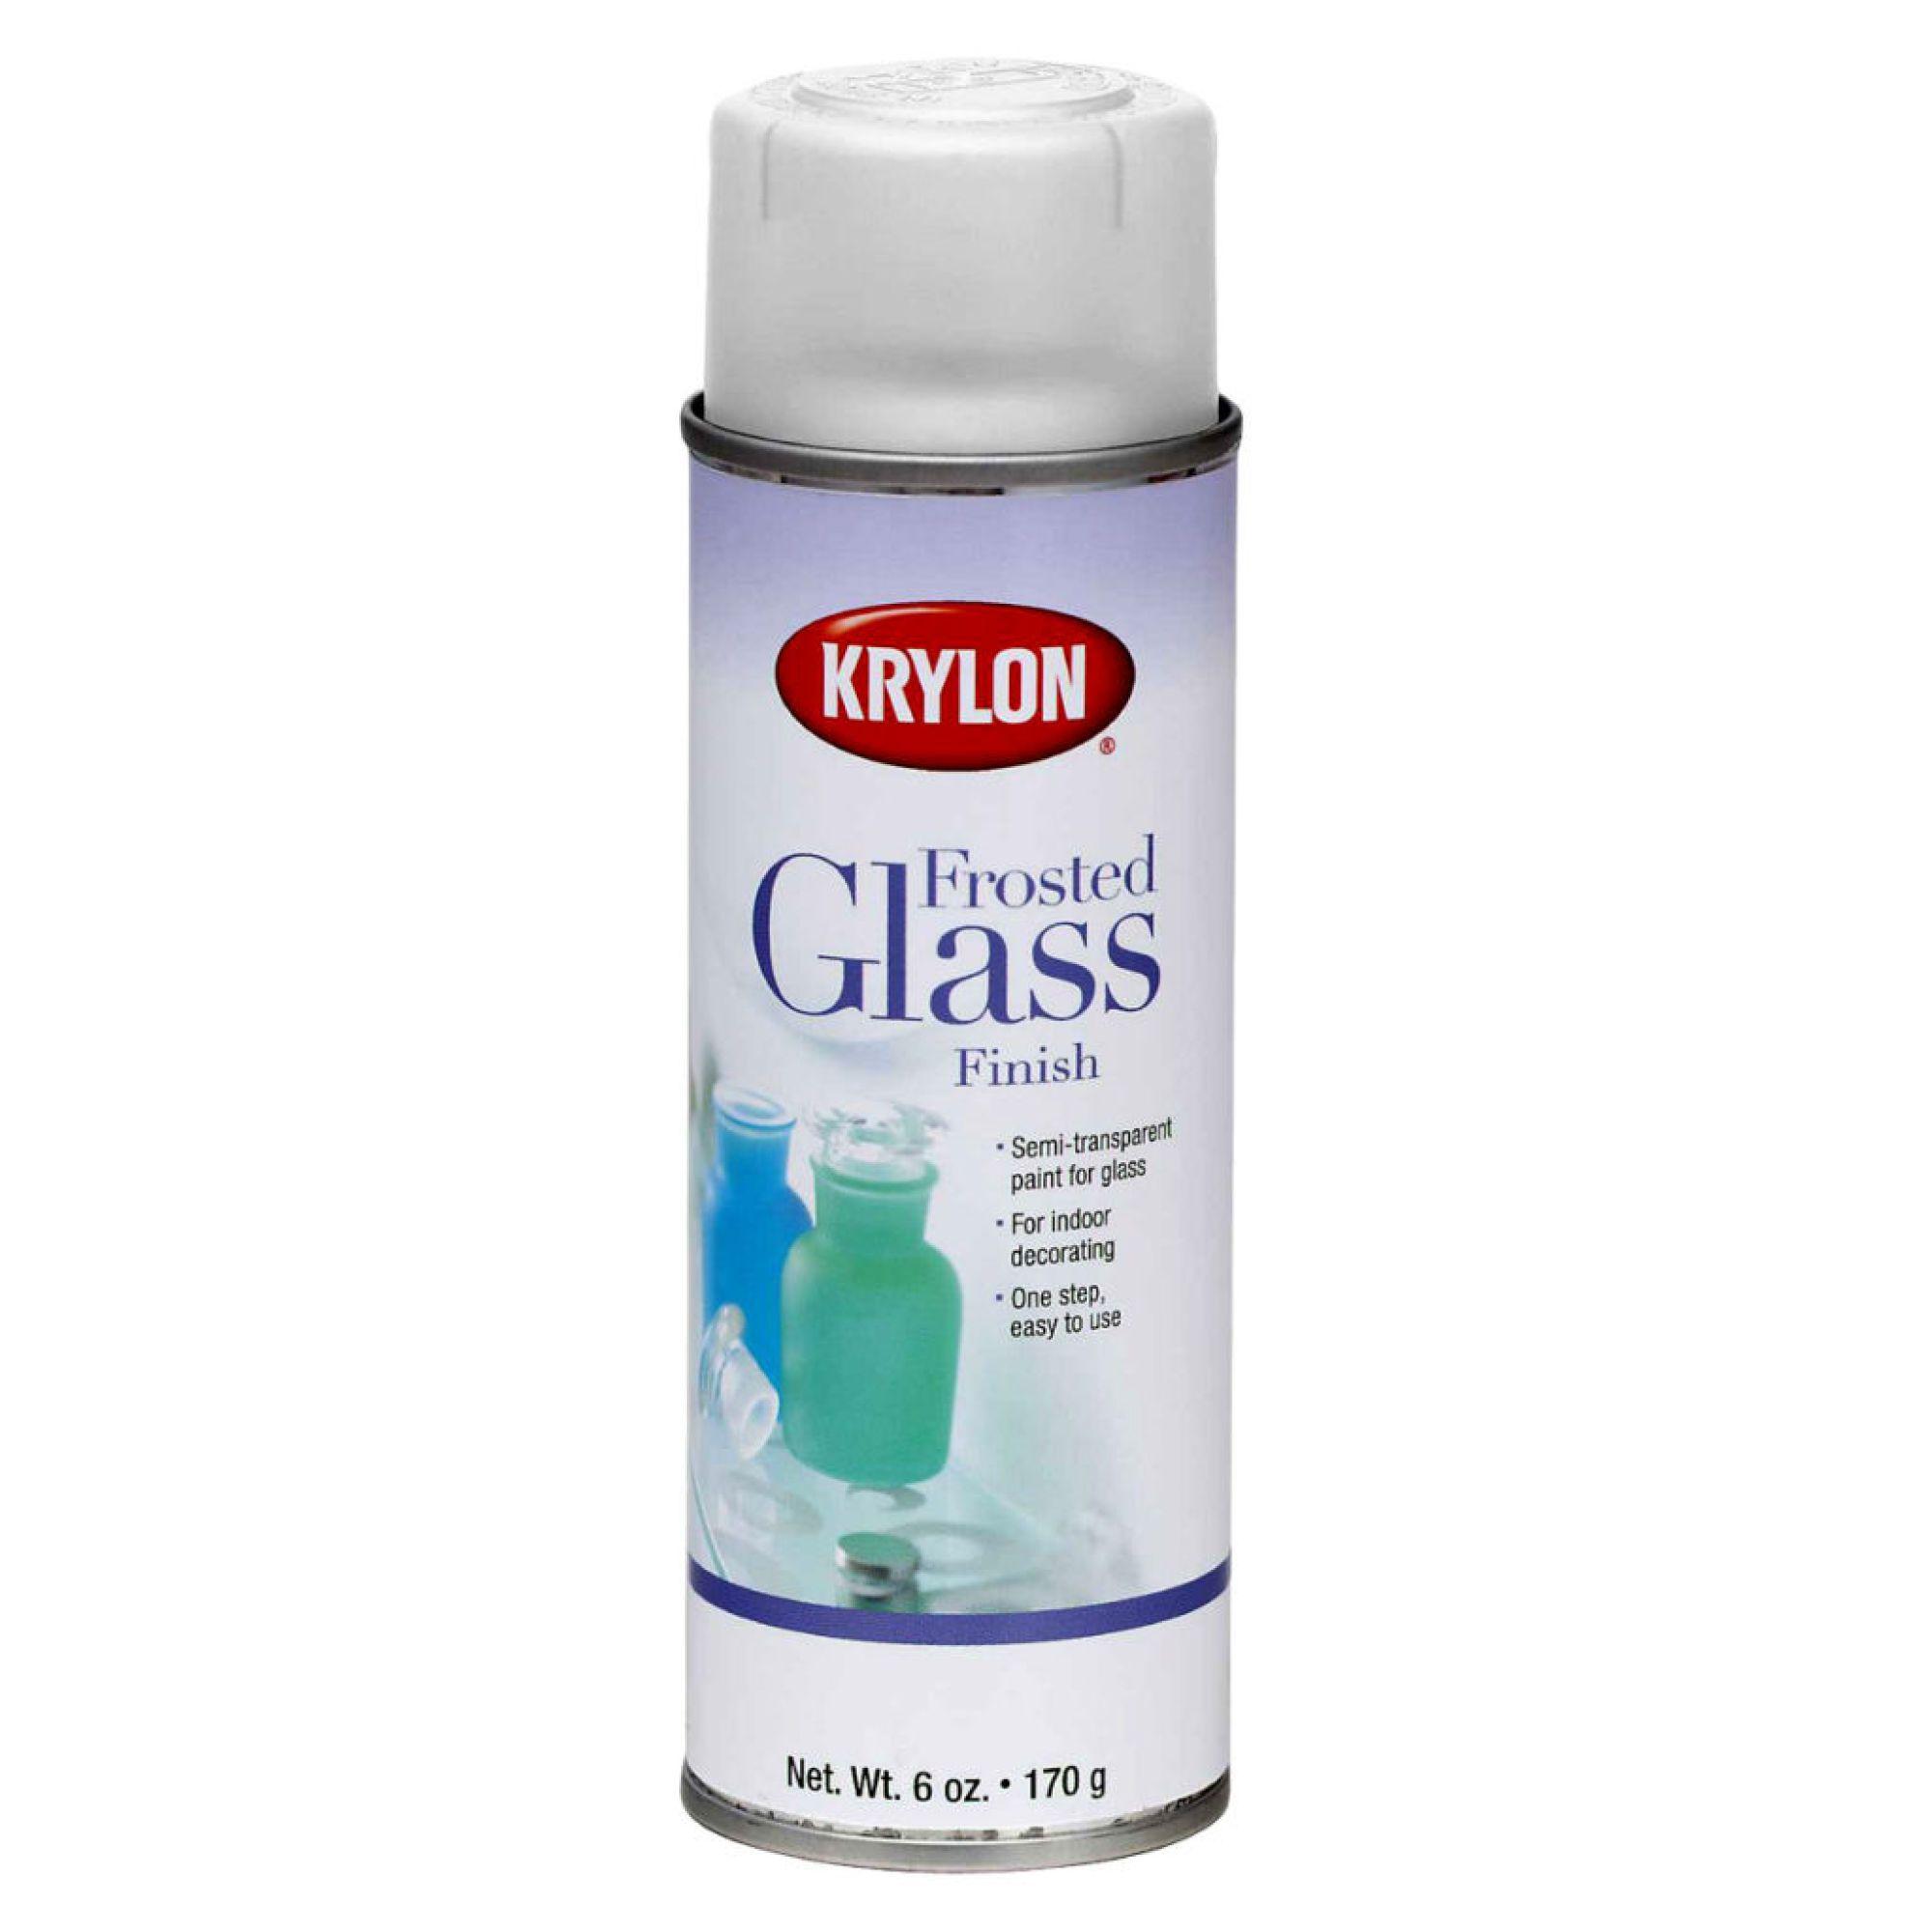 Krylon Frosted Glass Finish Frosted Glass Spray Best Spray